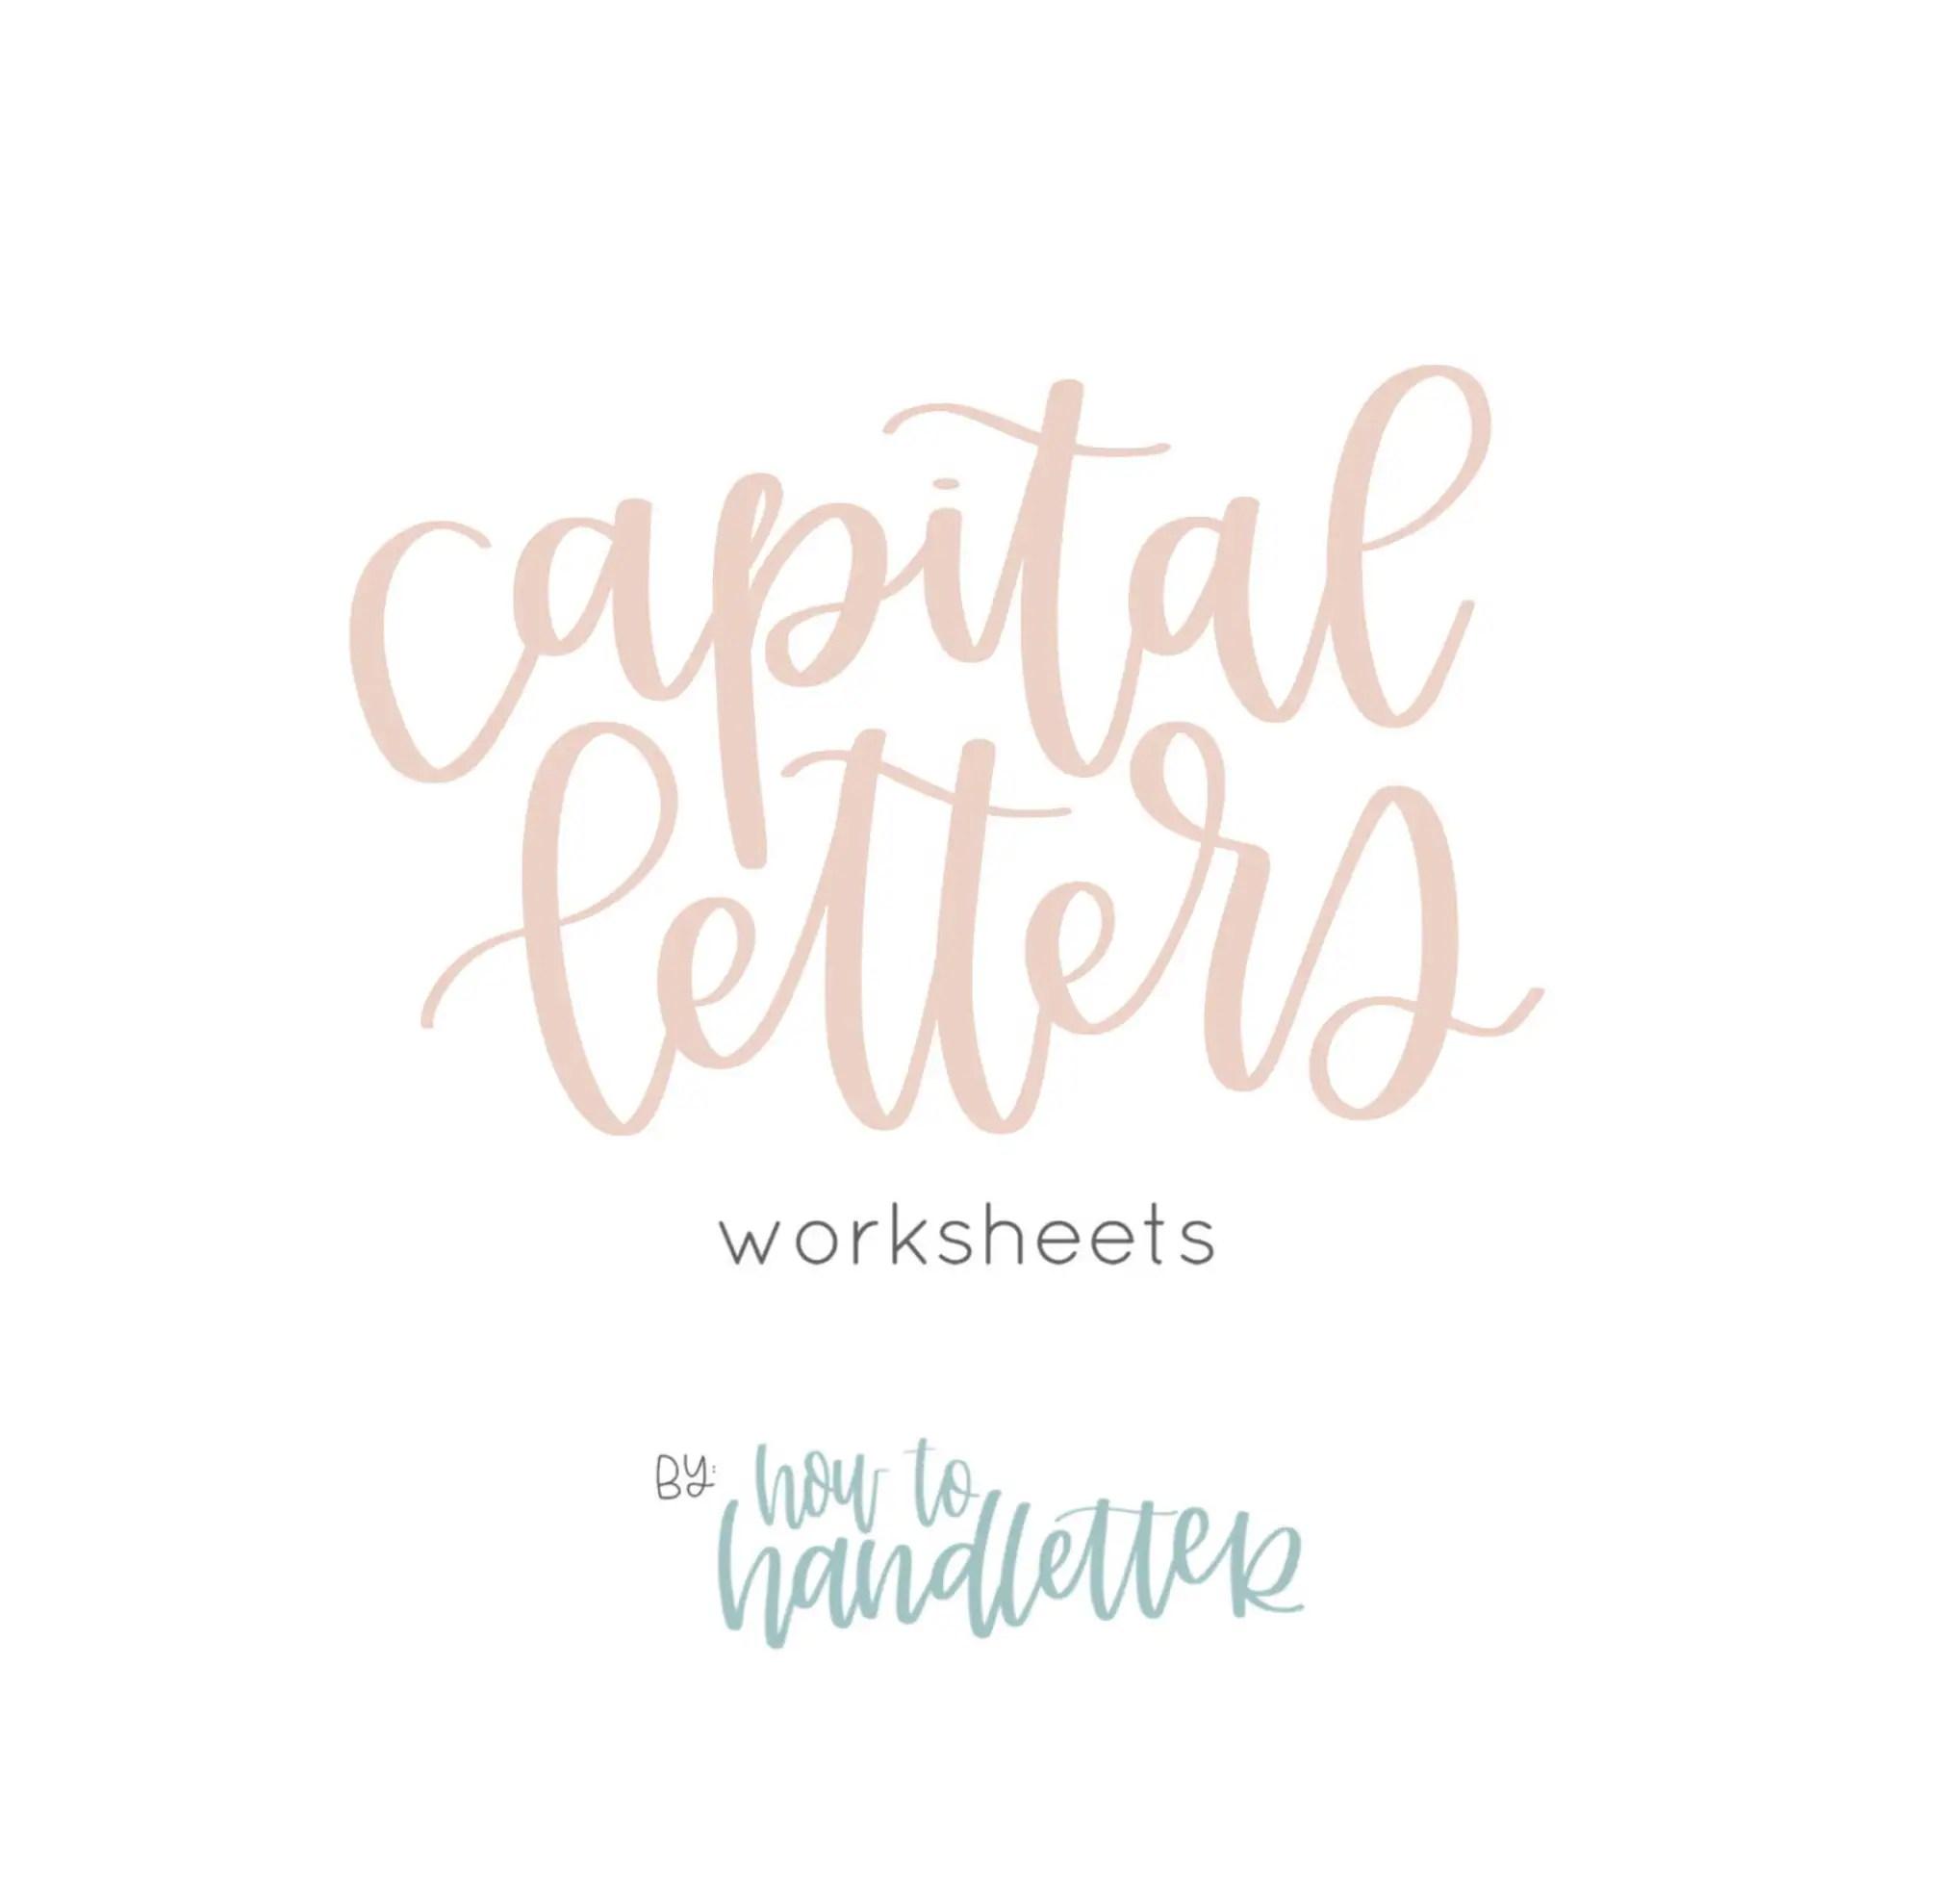 Capital Letters Handlettering Worksheets Printable Lettering